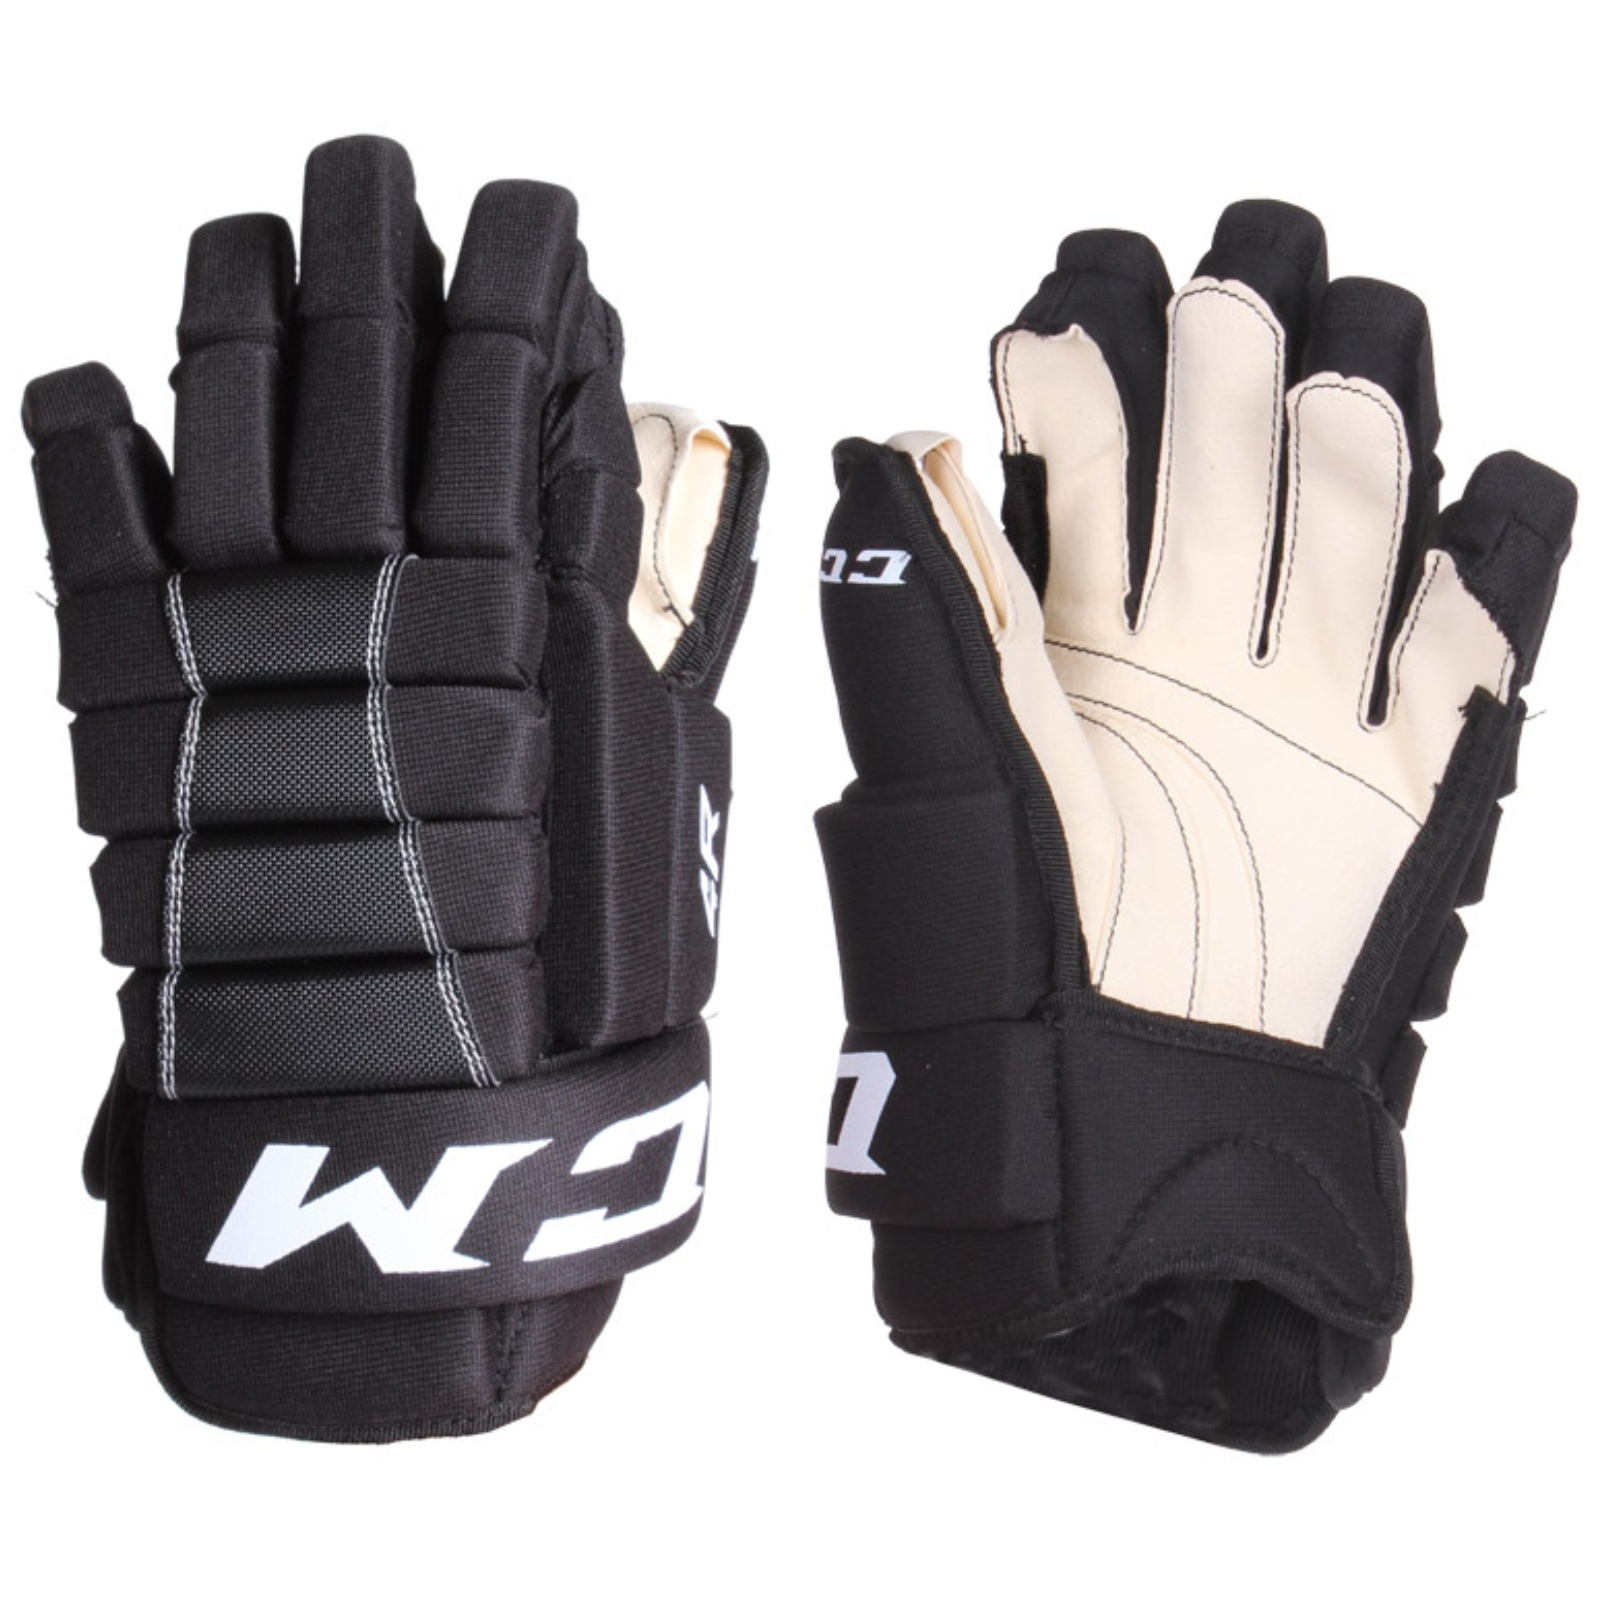 "Hokejové rukavice CCM 4R III junior, černo-bílé vel. 12"""